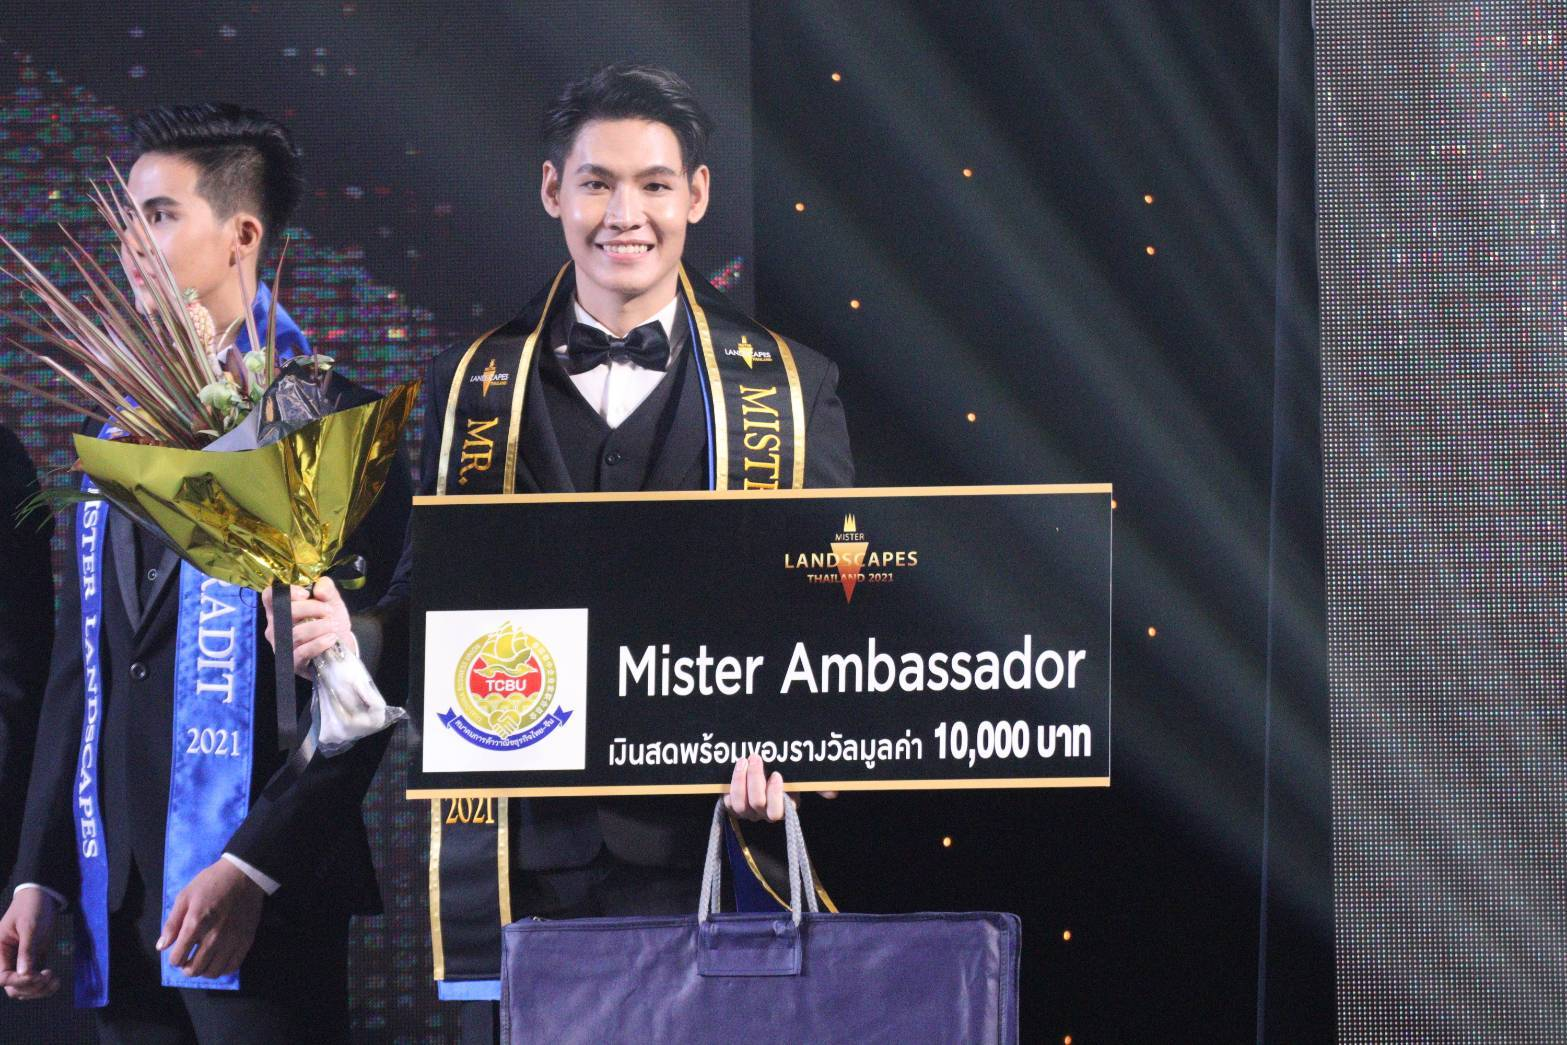 Mister Landscapes Thailand 2021 TAK ตาก น้องดอย ปางช้าง สุธินันท์ คมสัน